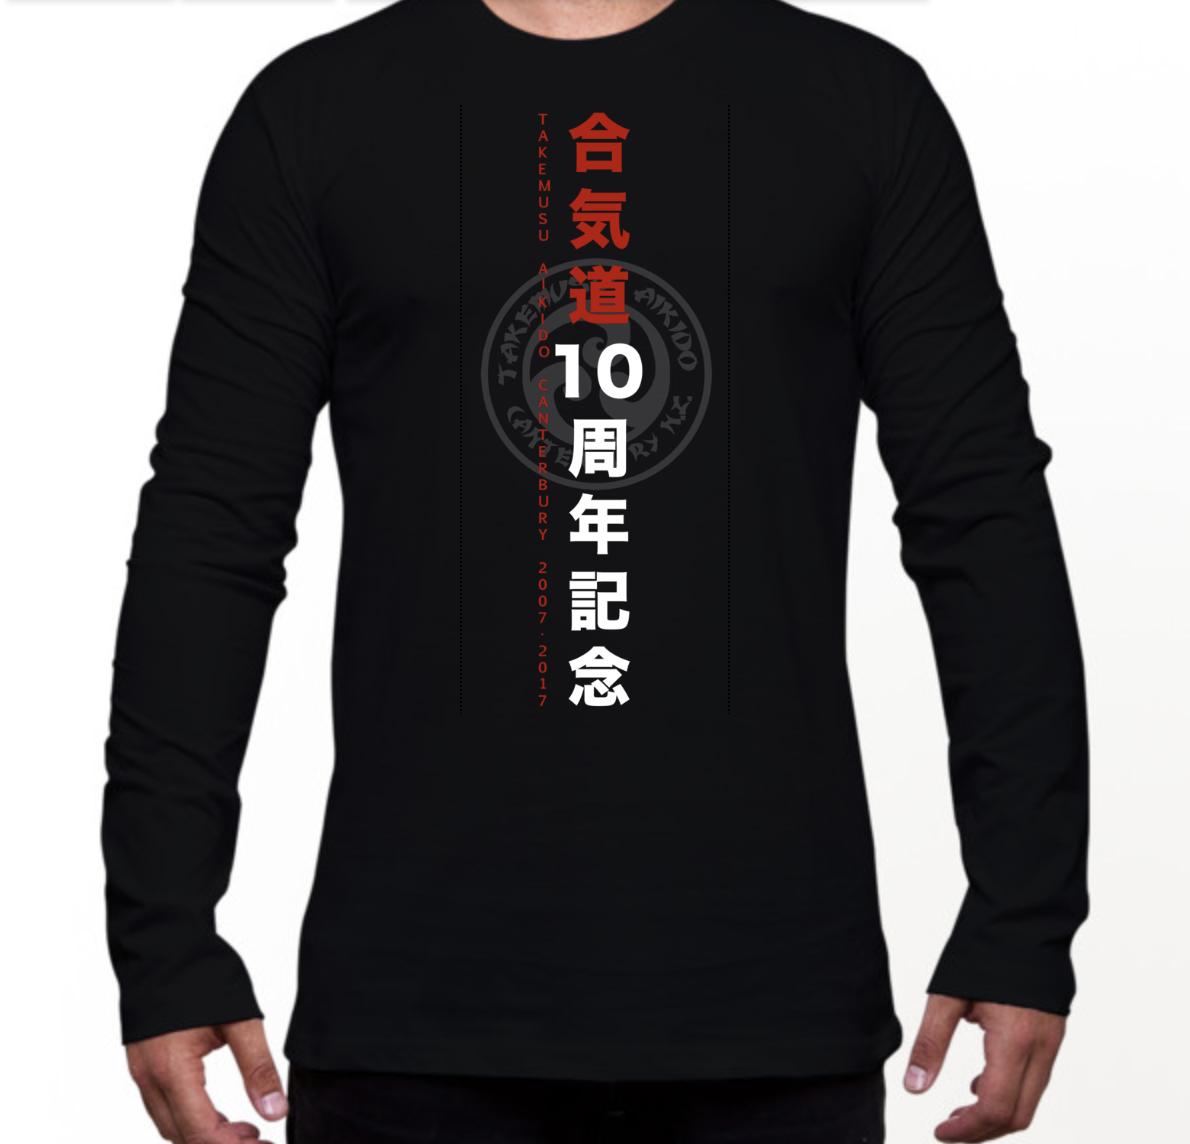 Black LS T-Shirt